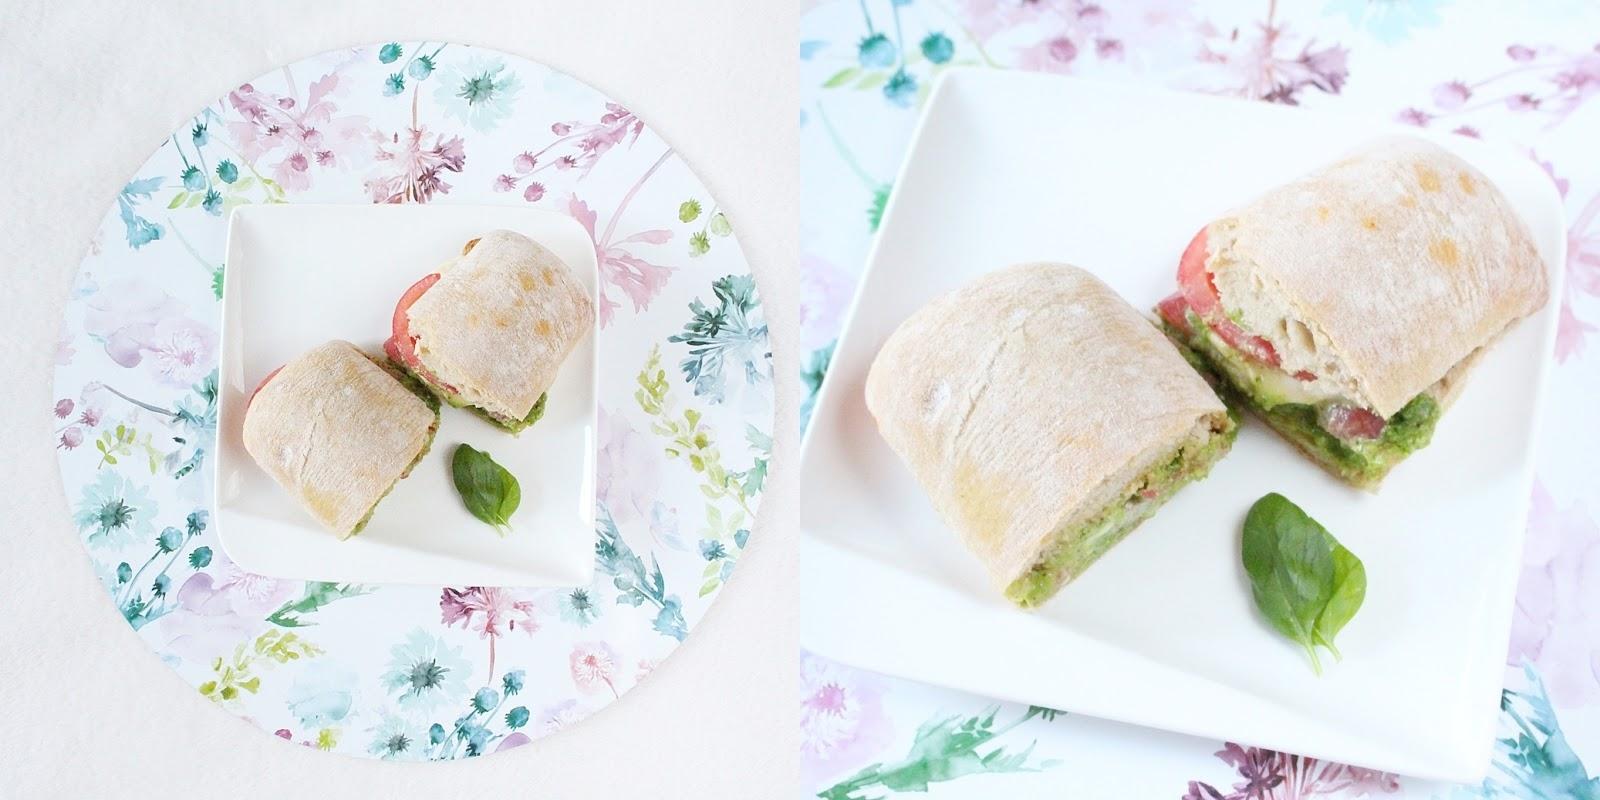 ciabatta-kwestia-smaku-pesto-foodbook